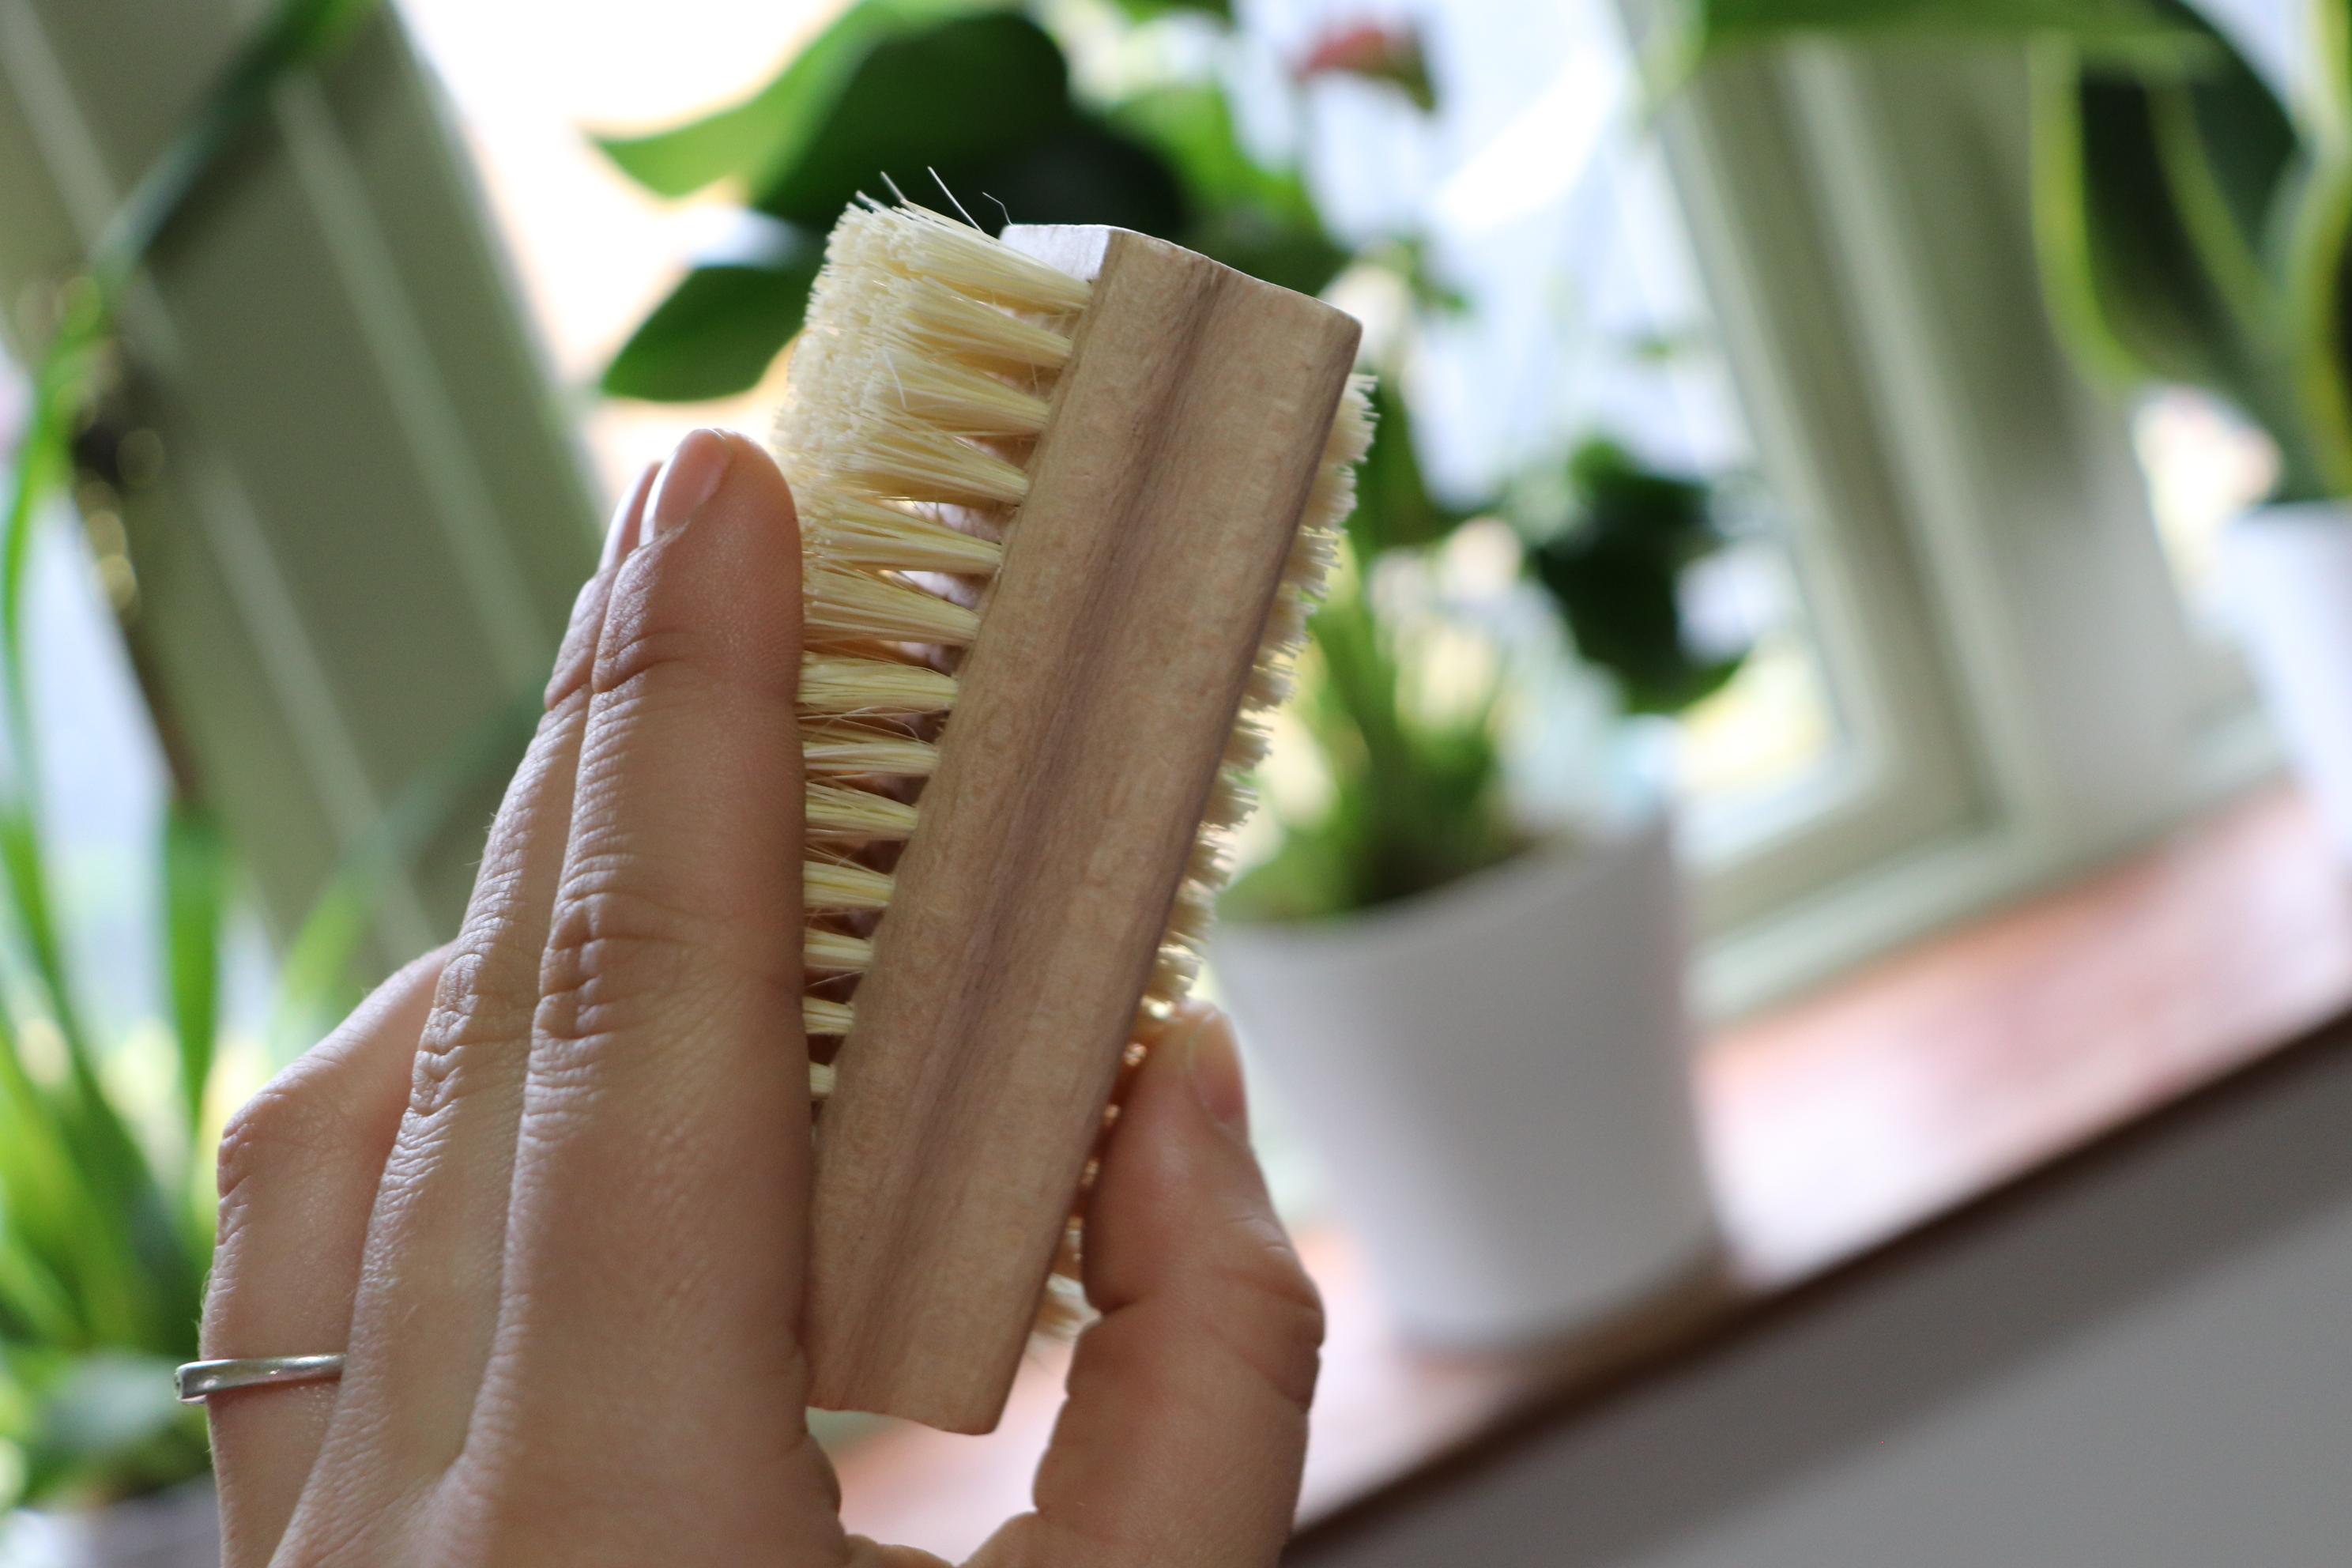 Nail brush of beech wood